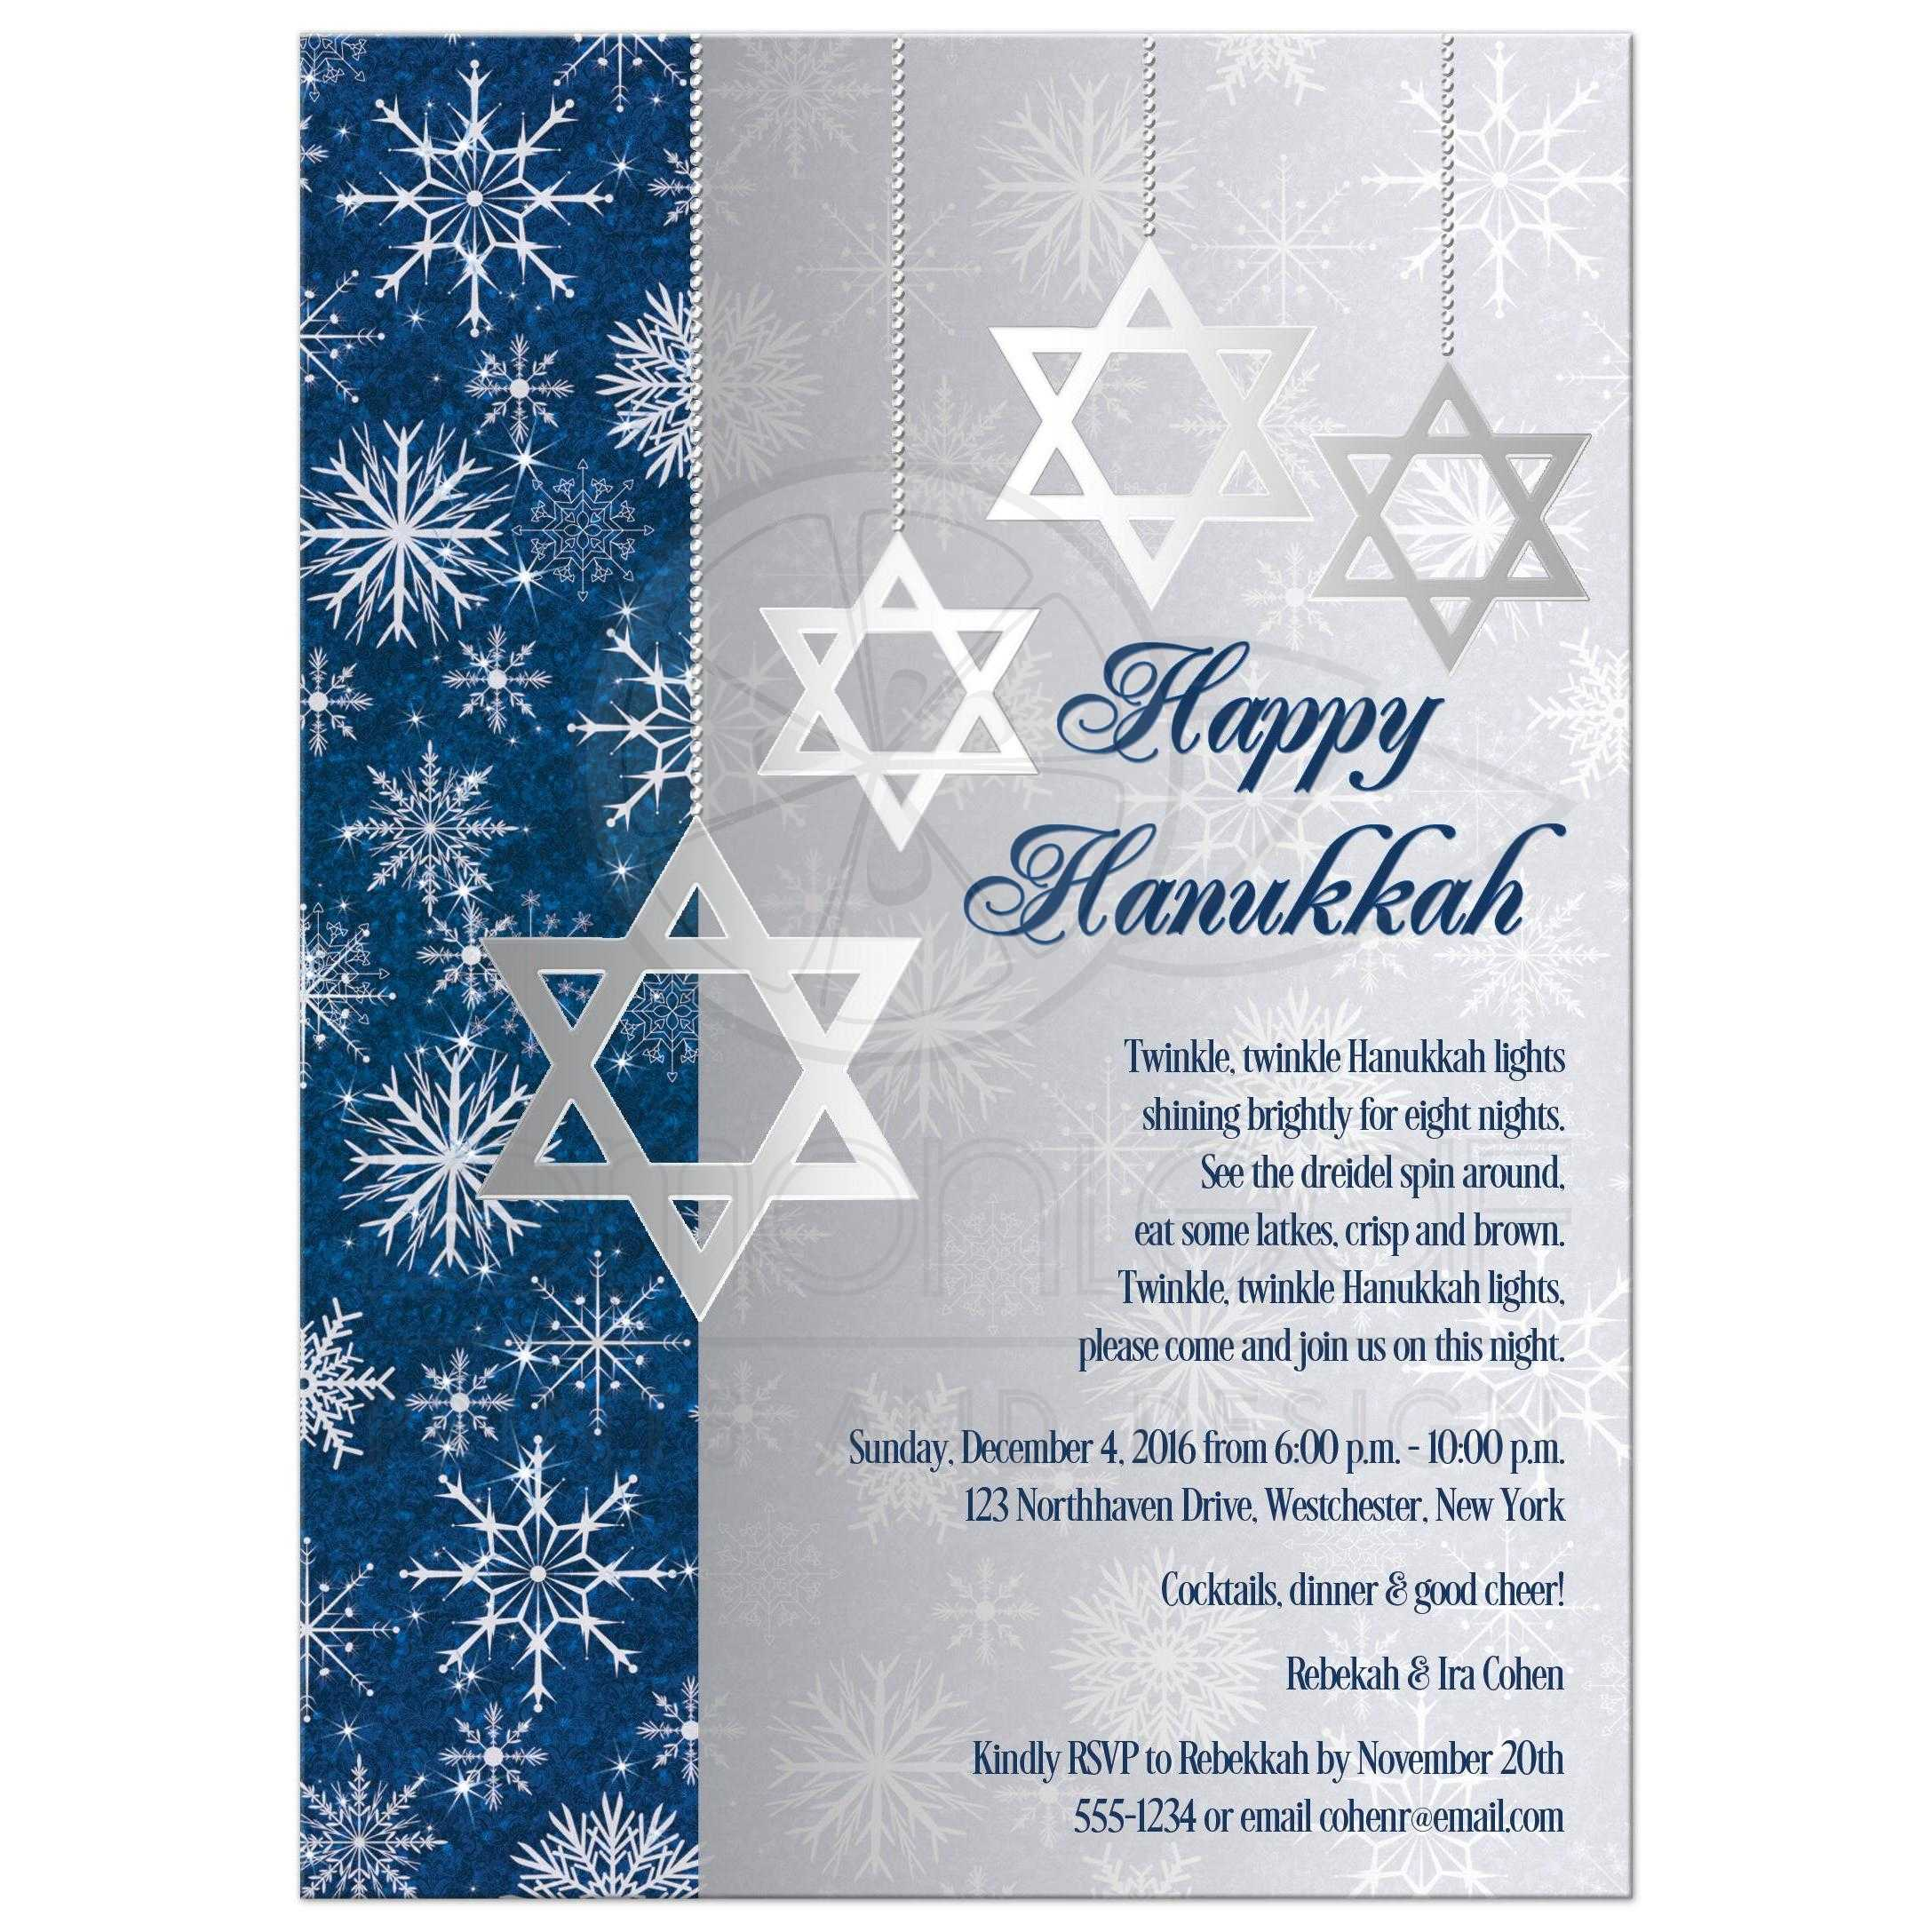 hanukkah party invitation royal blue silver white snowflakes